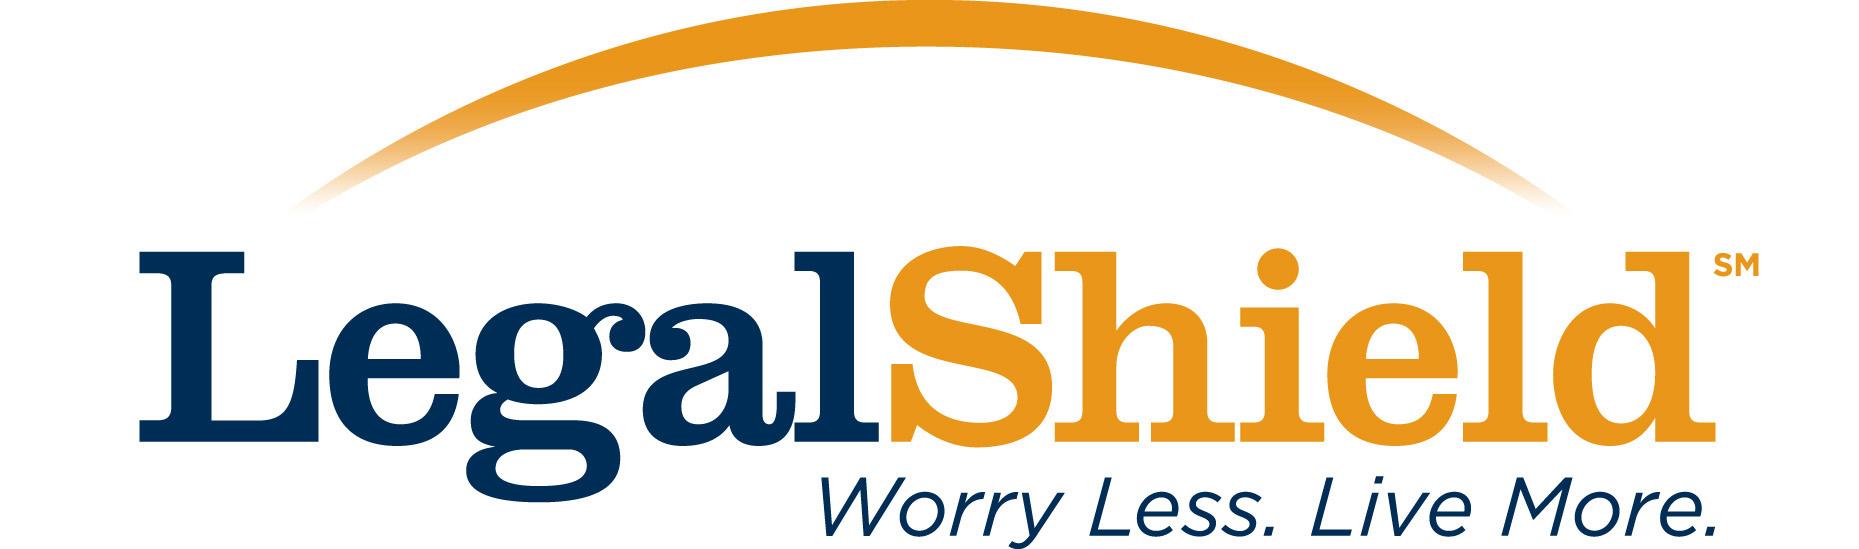 Logo_Legal_shield.jpg